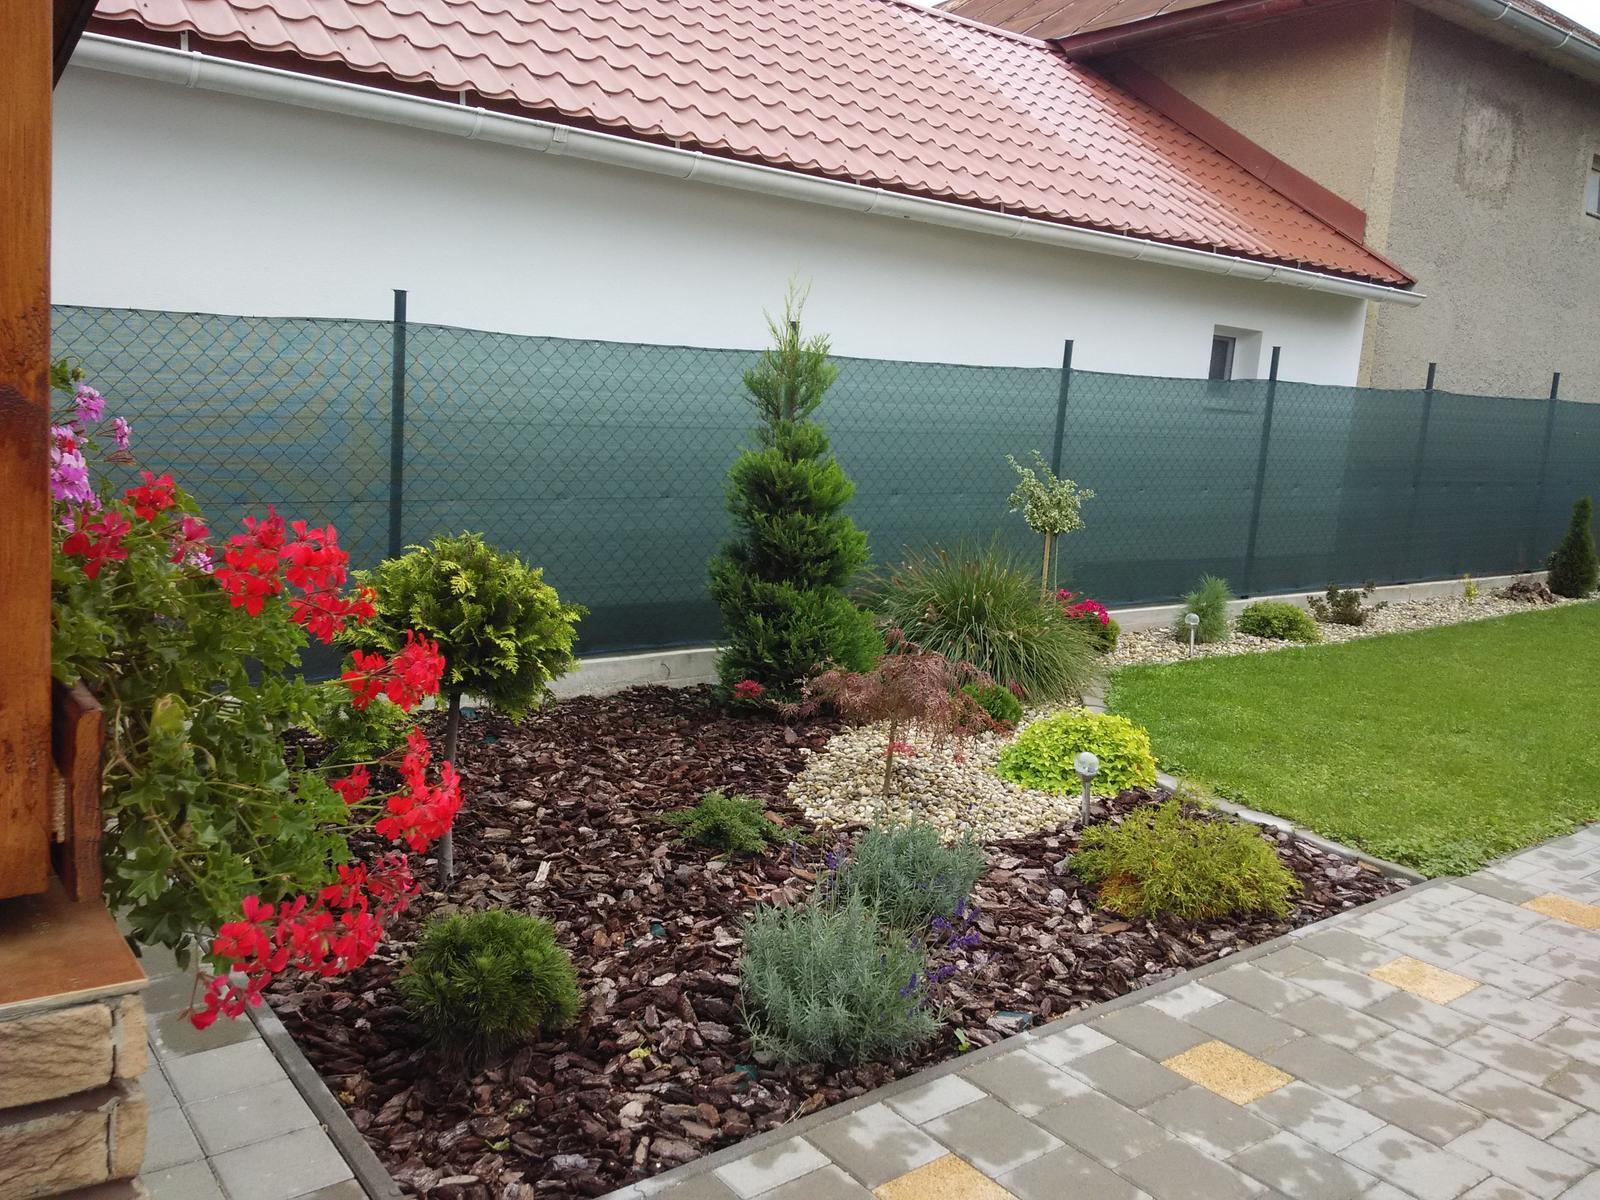 Dvor a zahrada 2015 - jesen